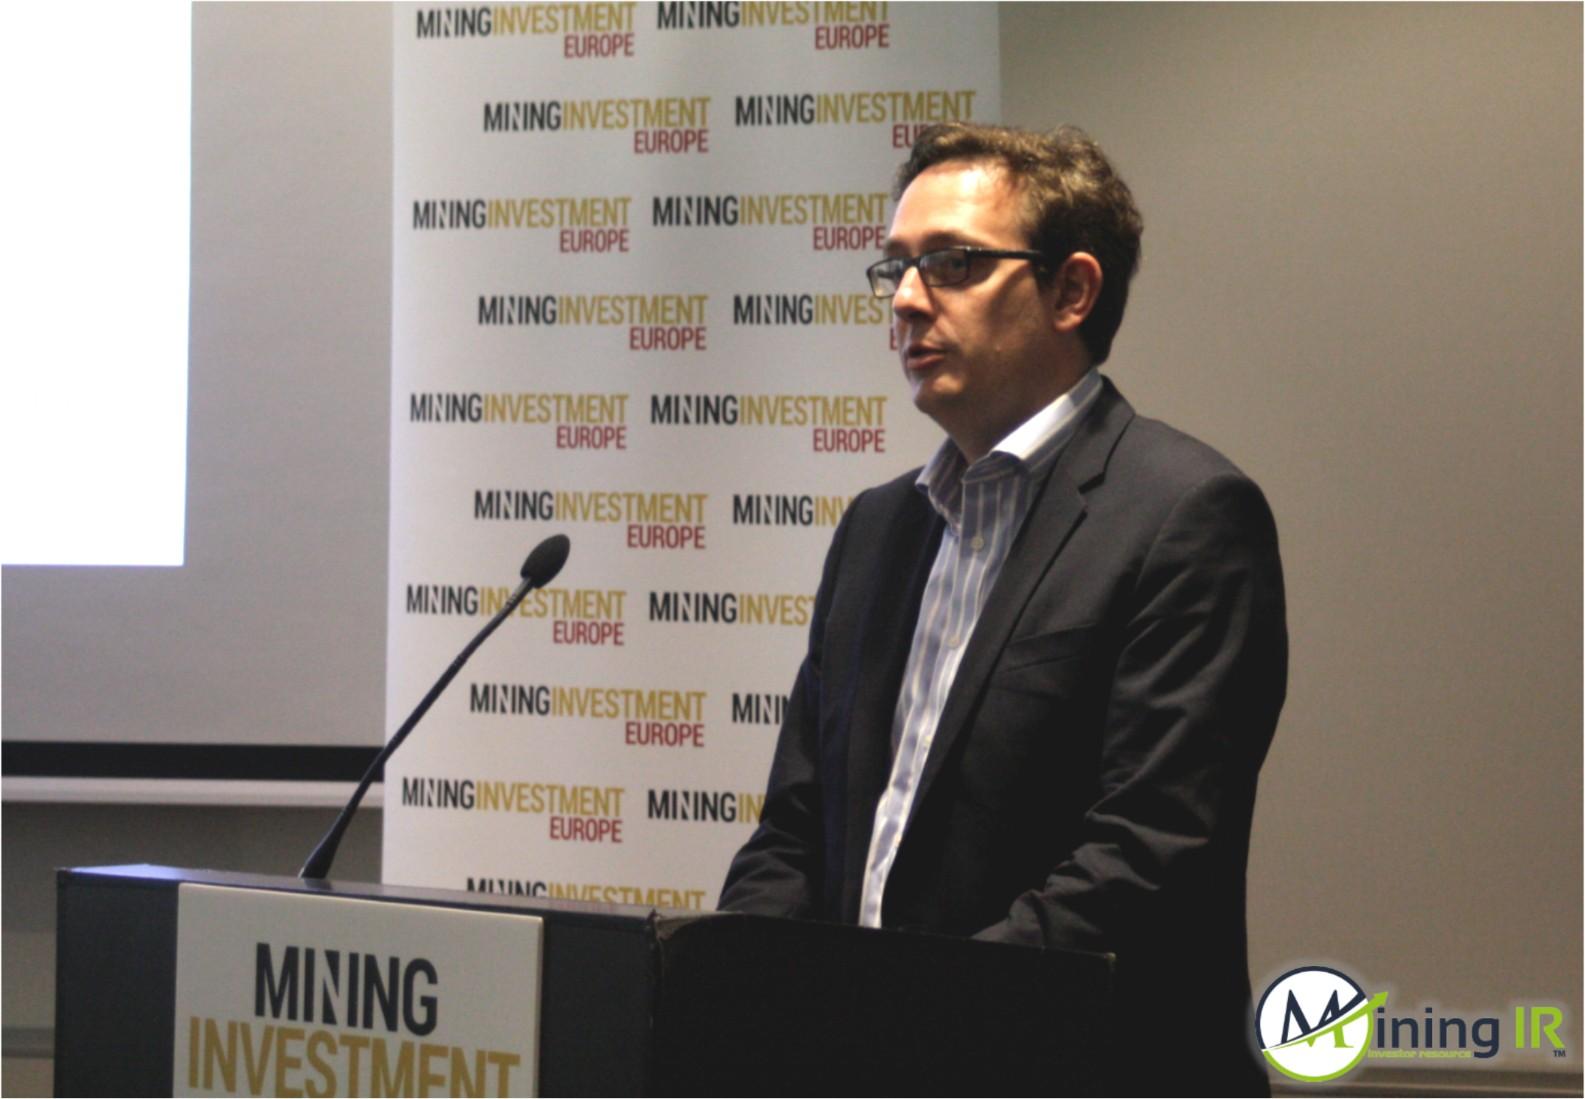 Phillip Sandner talks about the blockchain revolution in mining